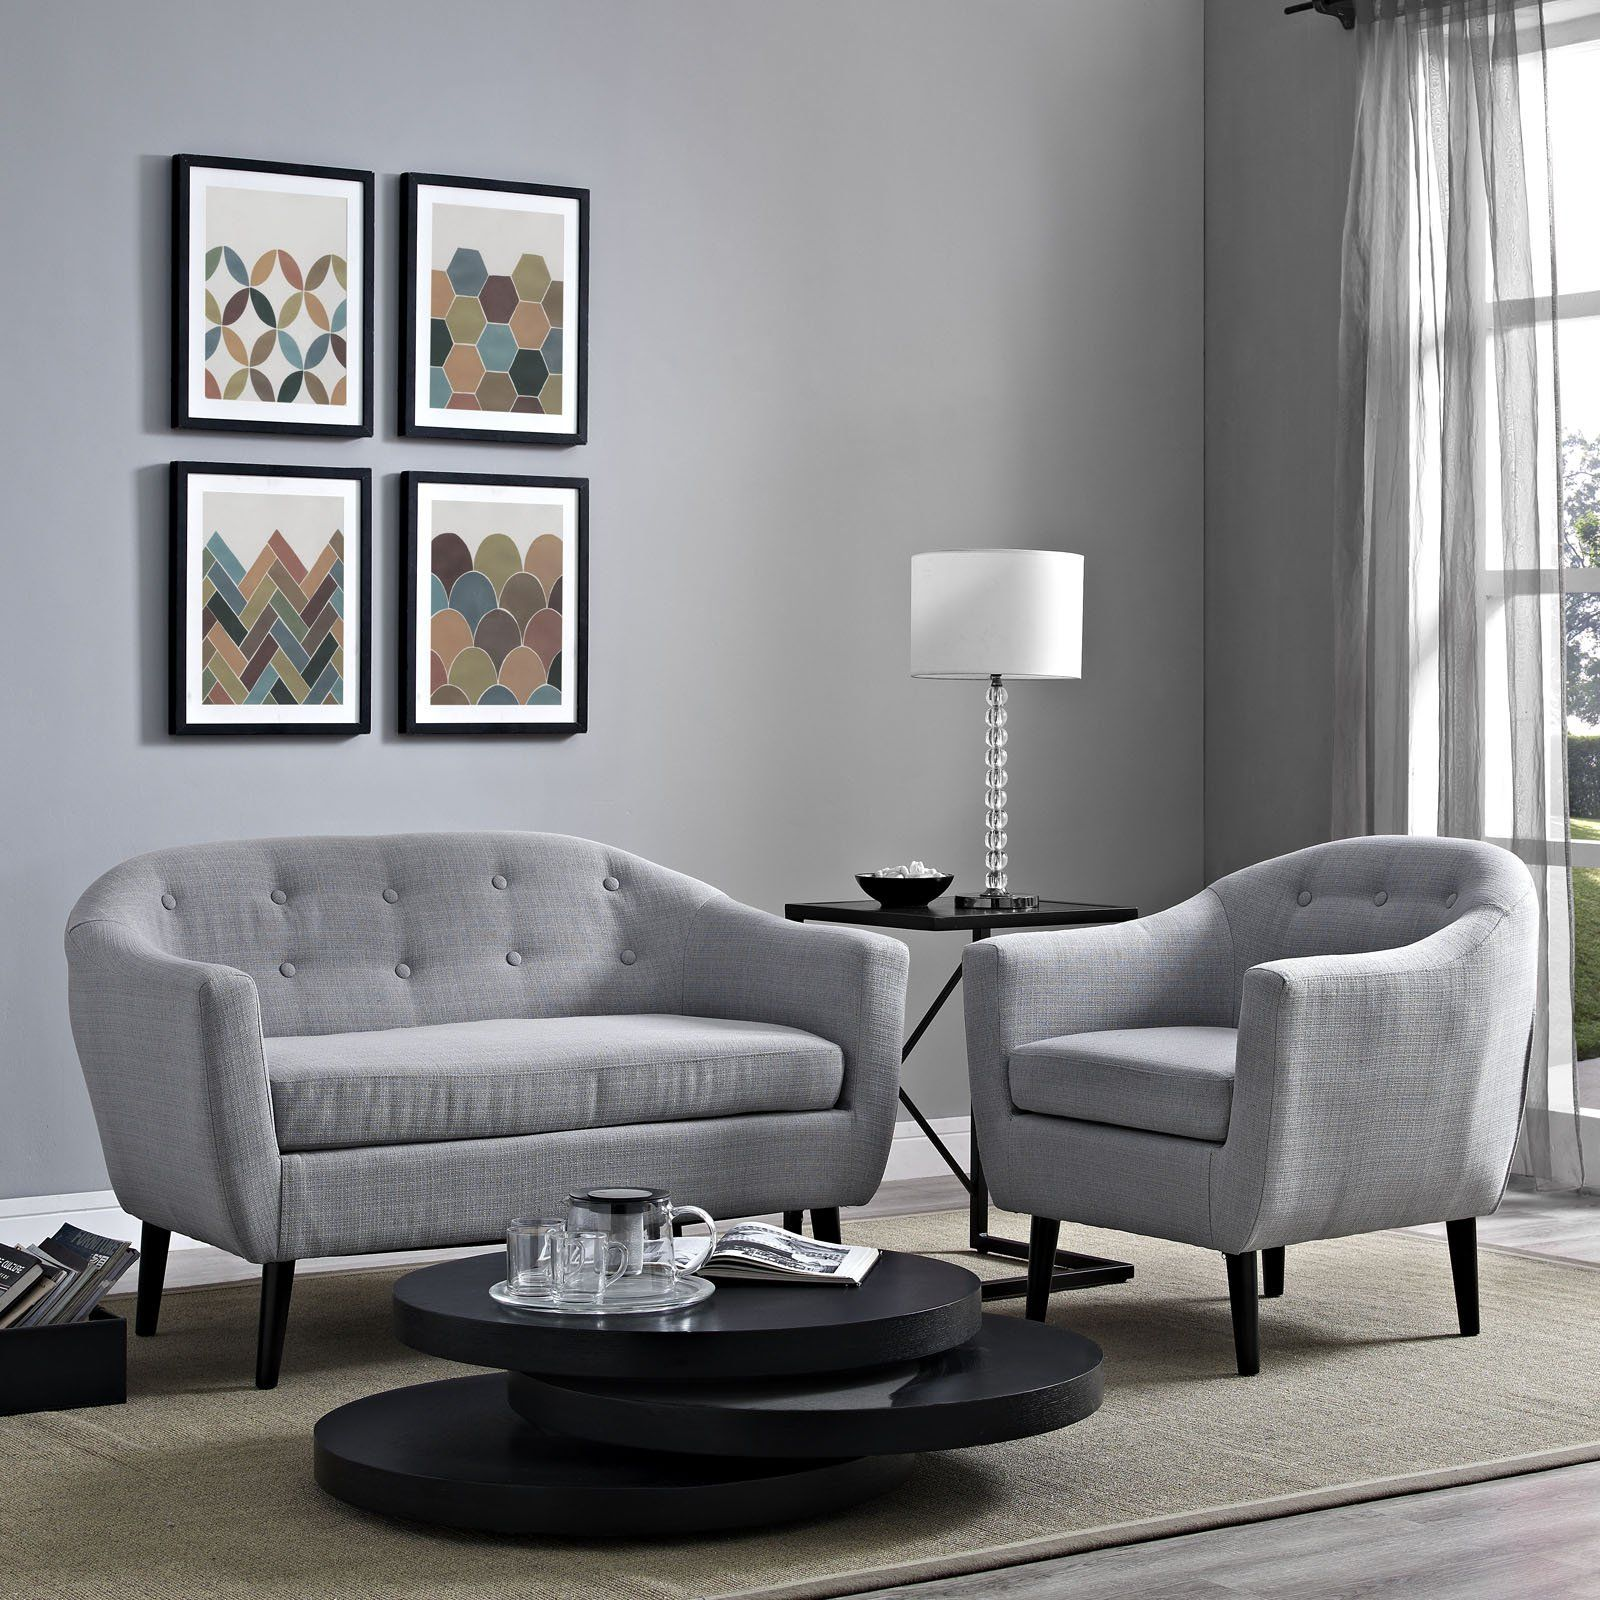 Modway Furniture Modern Wit 2 Piece Living Room Set - EEI ...